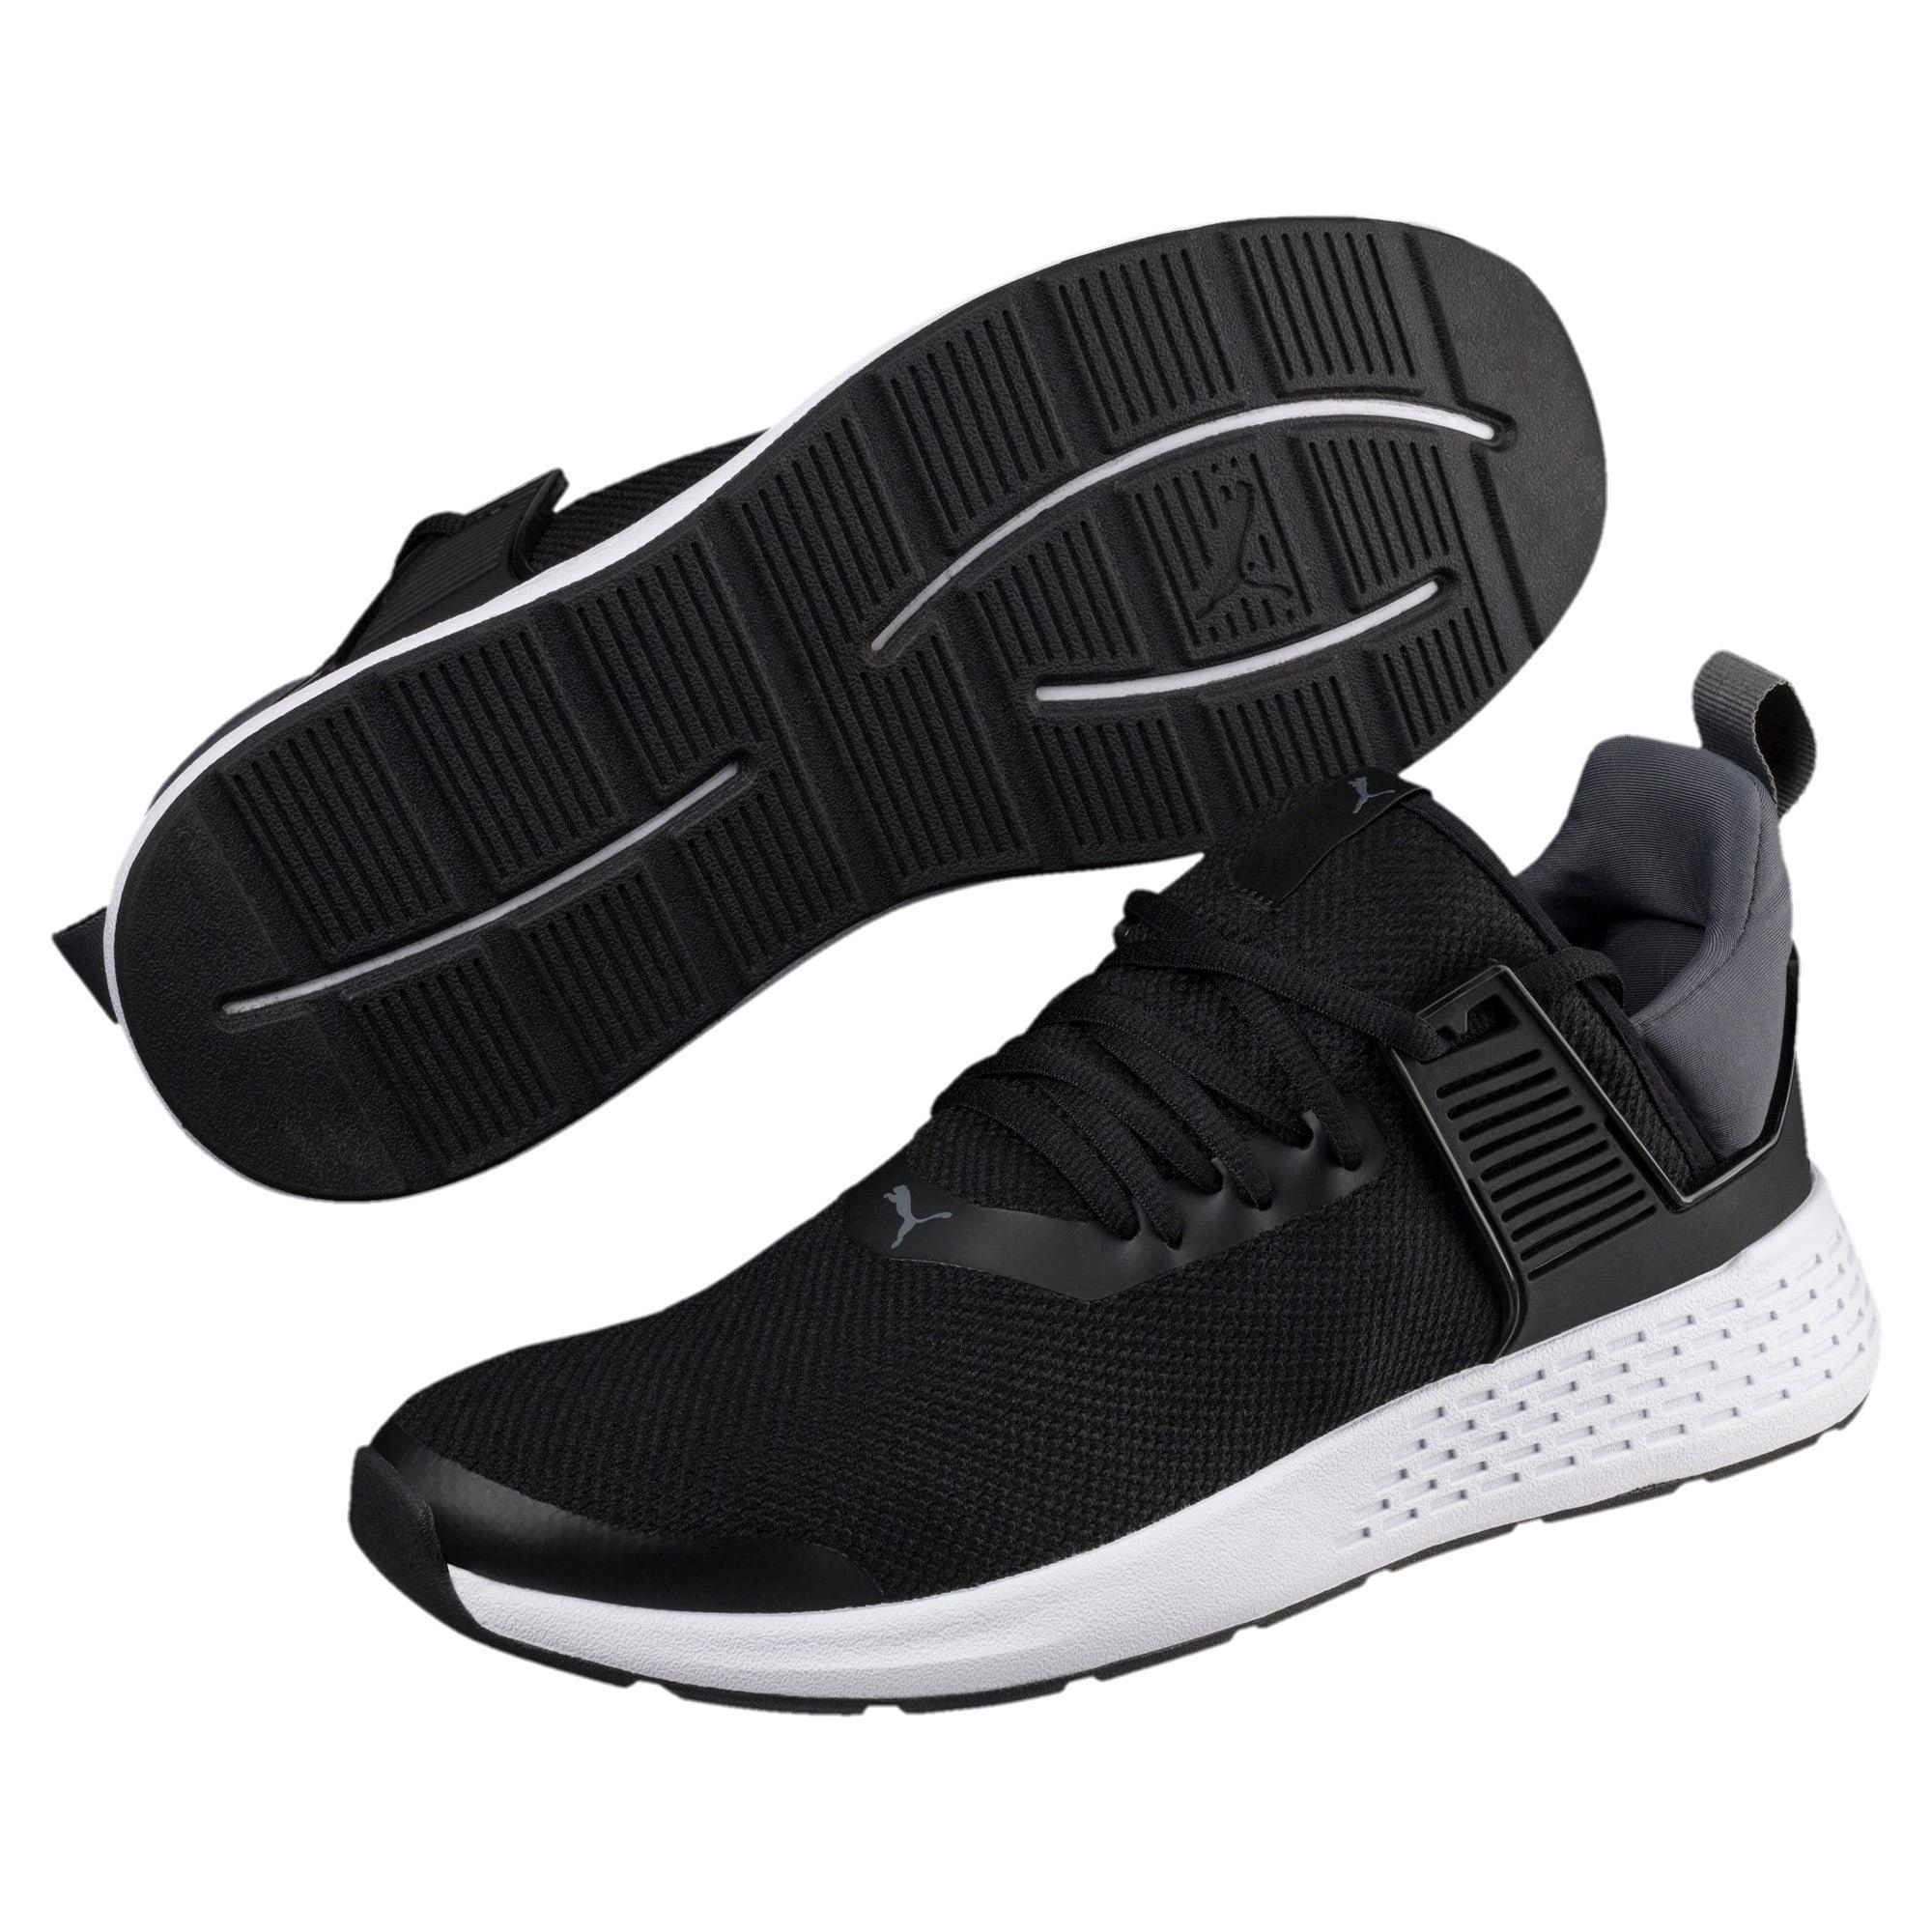 Thumbnail 2 of Insurge Mesh  Sneakers, Black-Iron Gate-White, medium